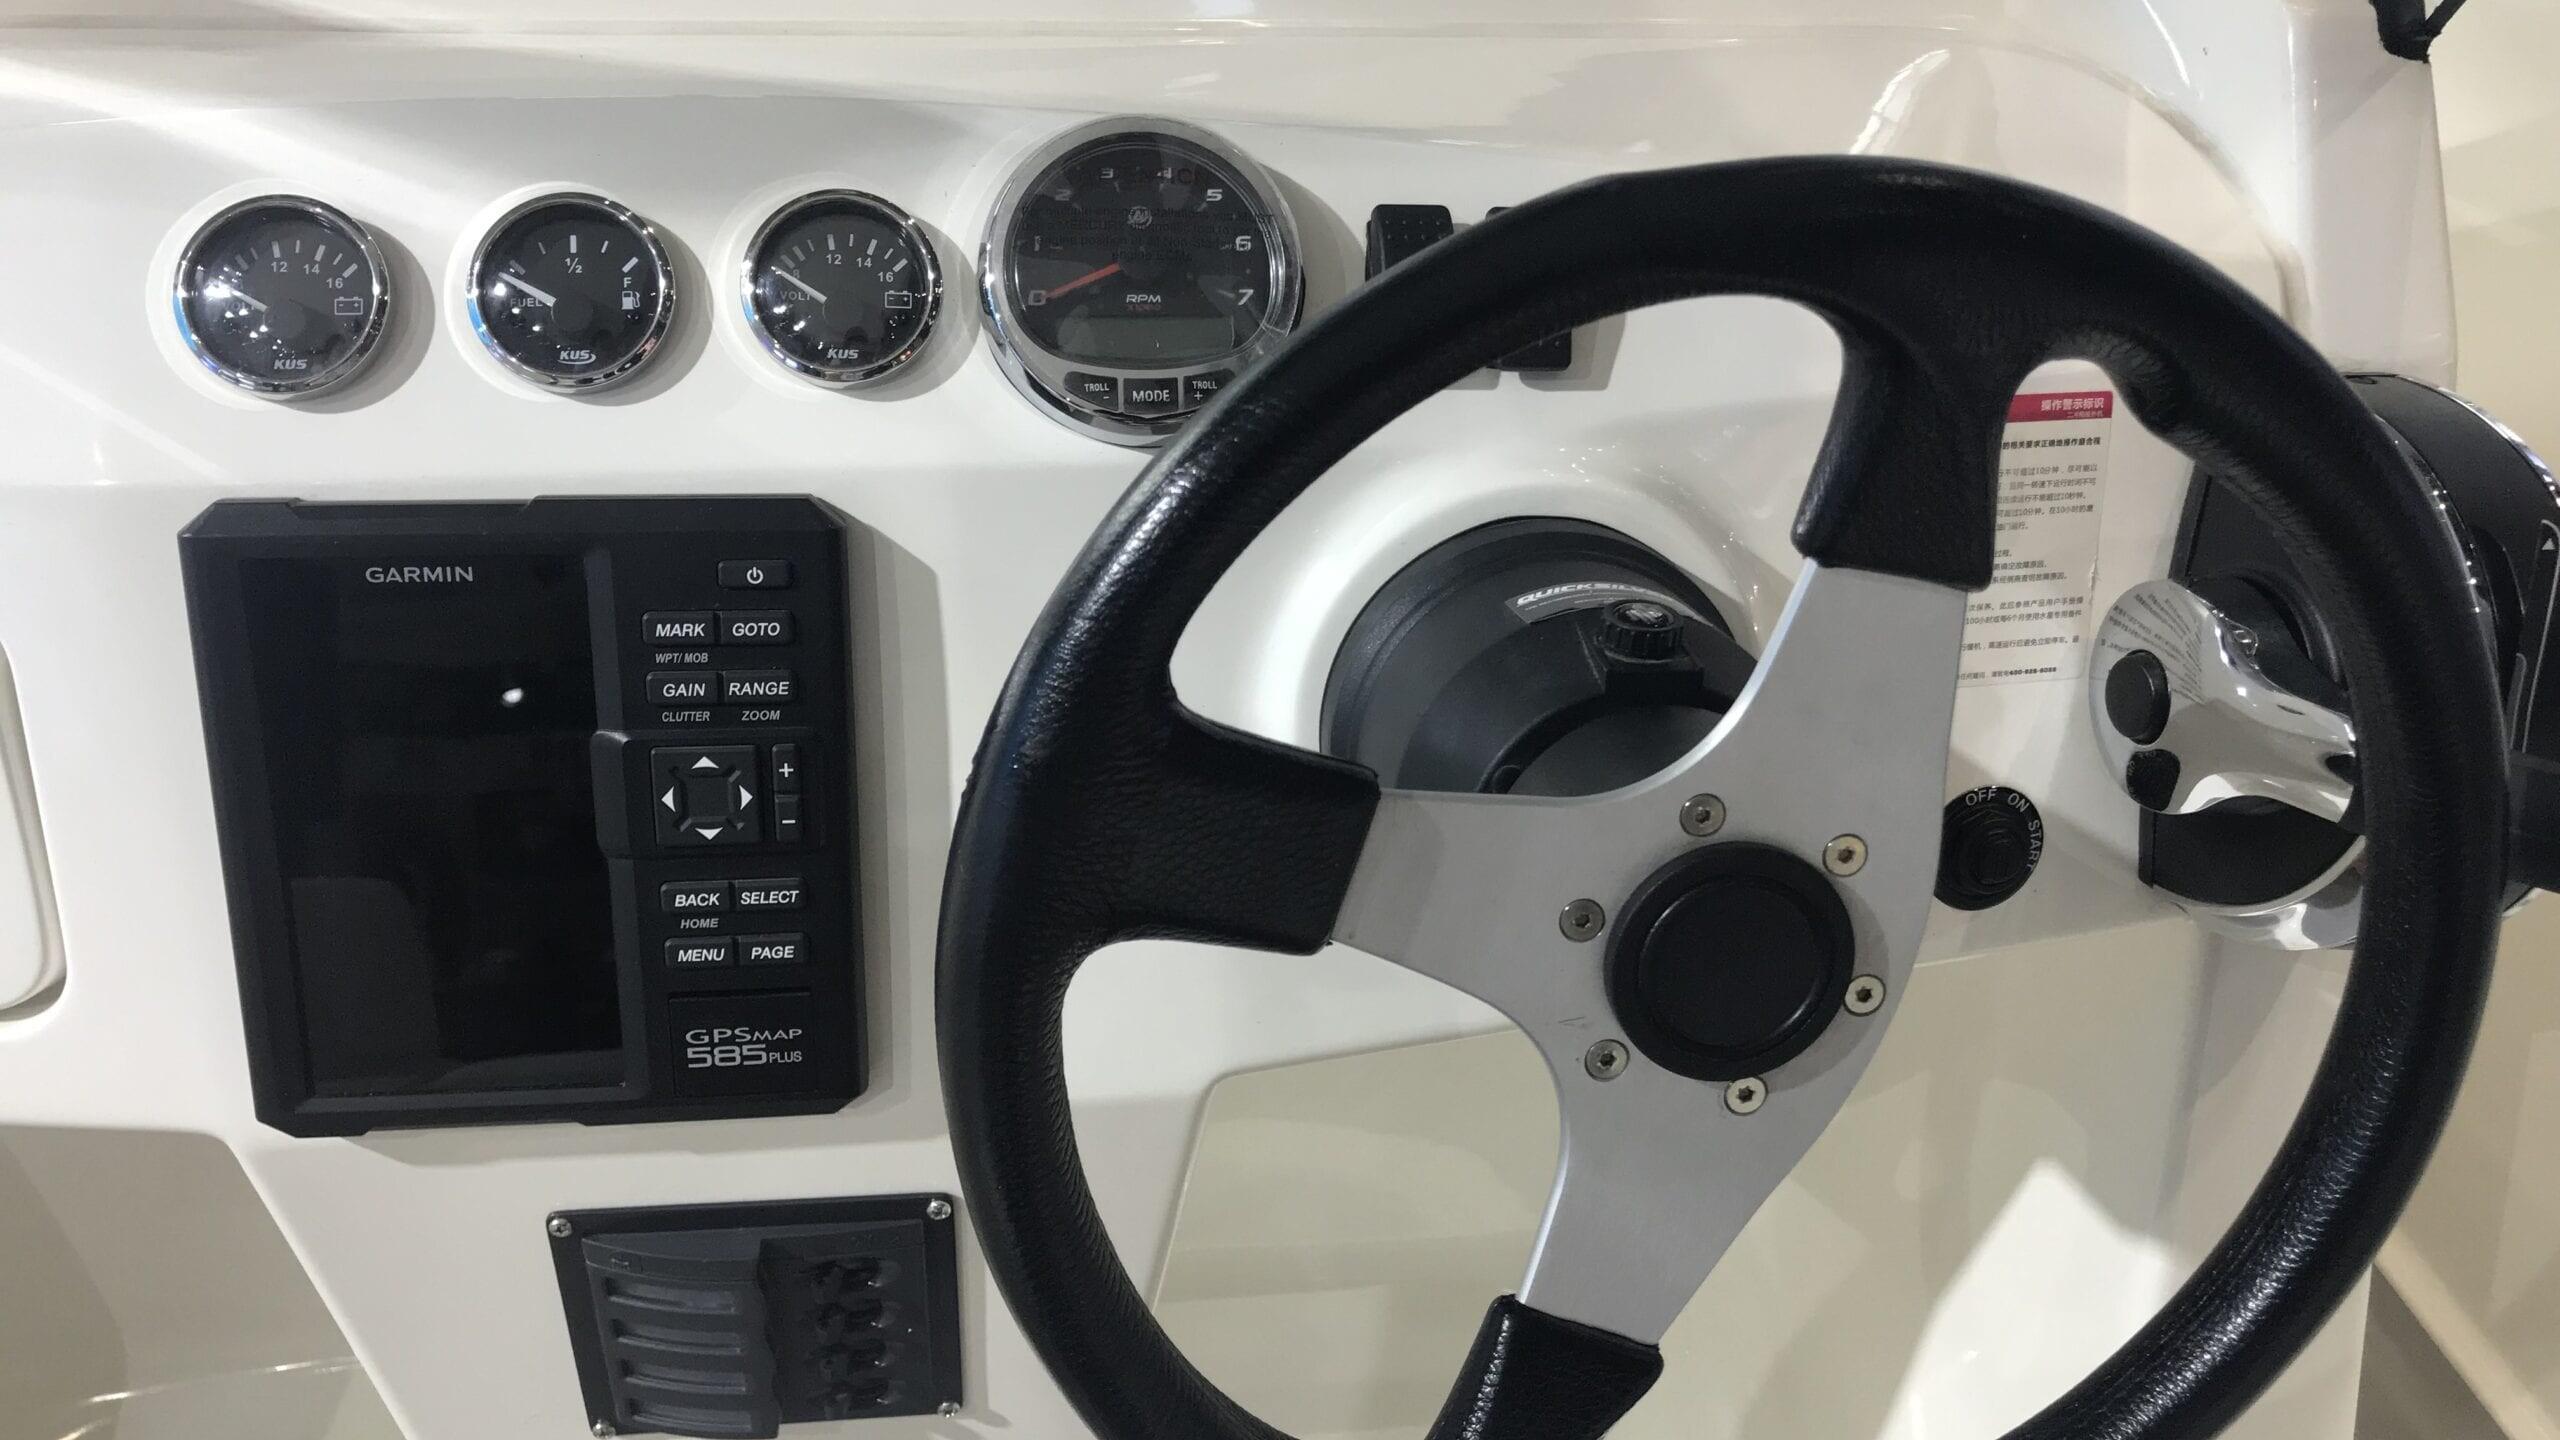 KUS Voltmeter & Fuel Gauge Alongside Tachometer & Garmin GPS